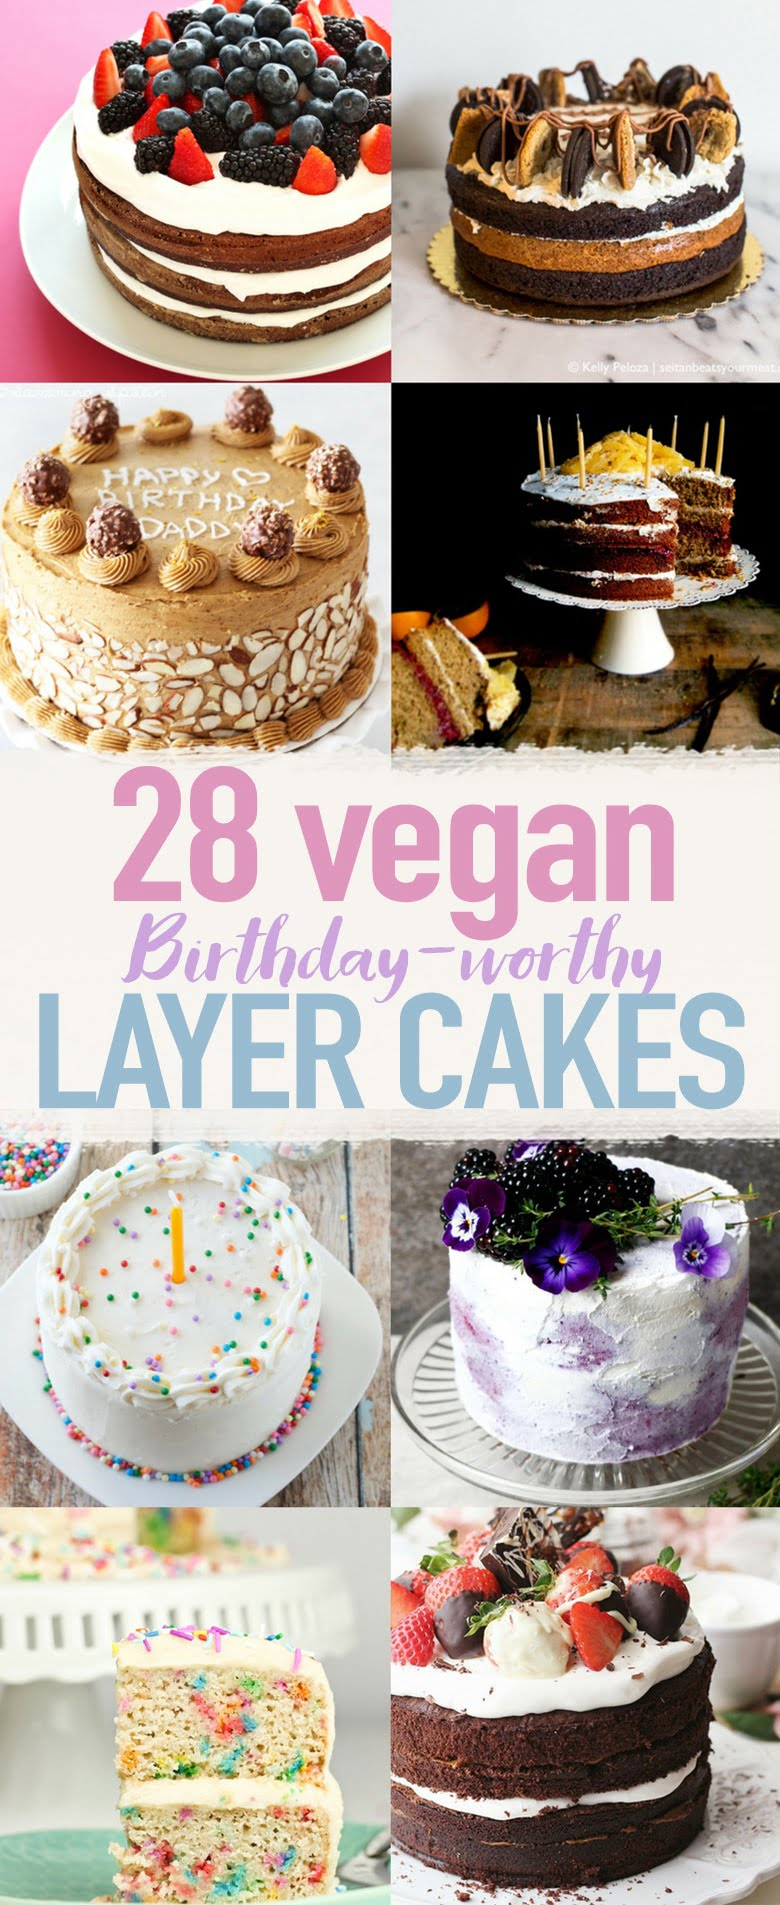 28 Birthday-Worthy Vegan Layer Cakes